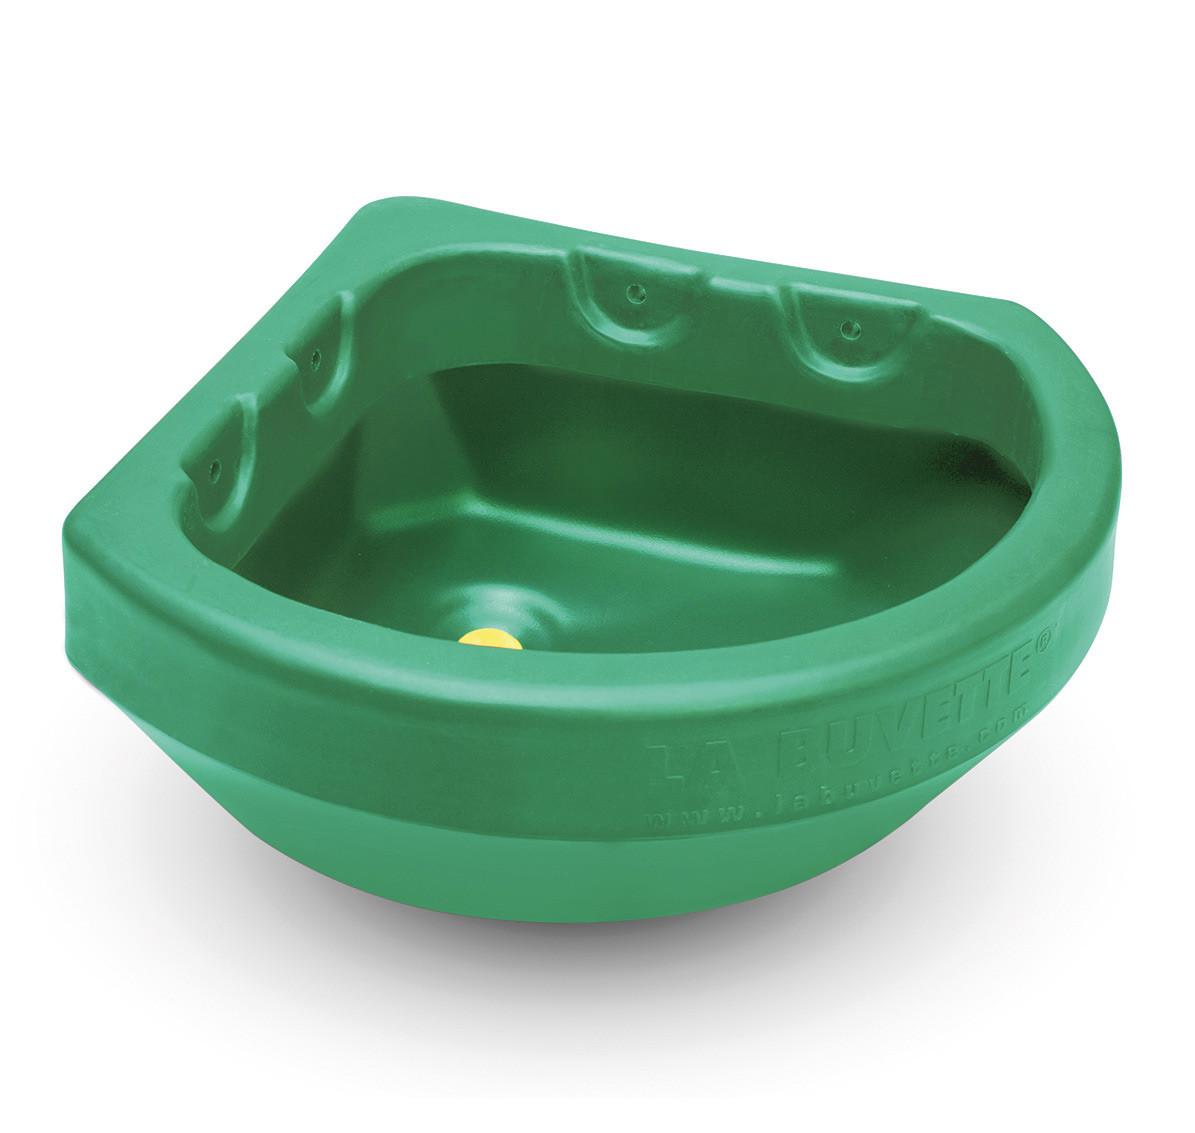 Mangeoire cheval pour angle de box - anti gaspillage